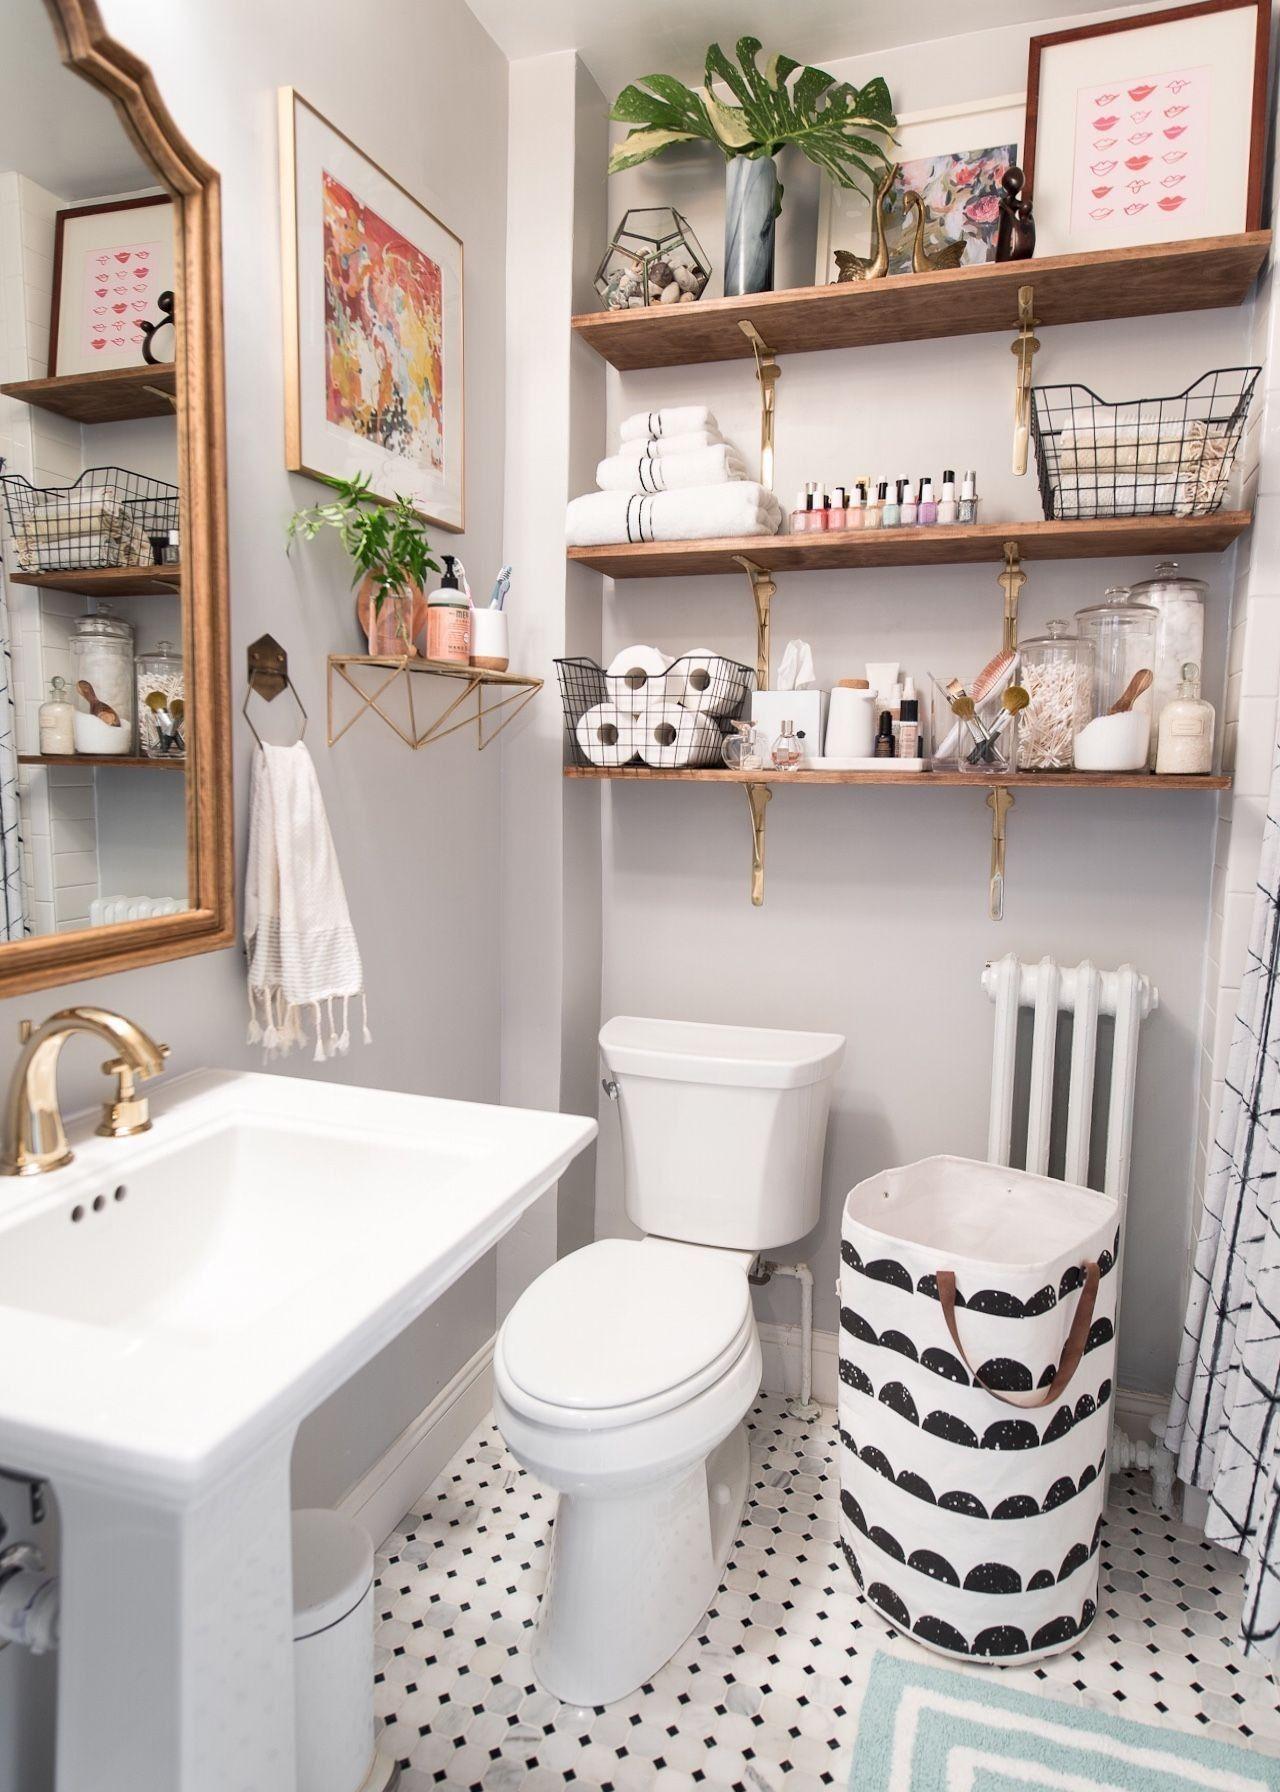 97 Best Practical Bathroom Organization Ideas 2020 Small Bathroom Furniture Small Bathroom Decor Classic Small Bathrooms Practical bathroom organization ideas